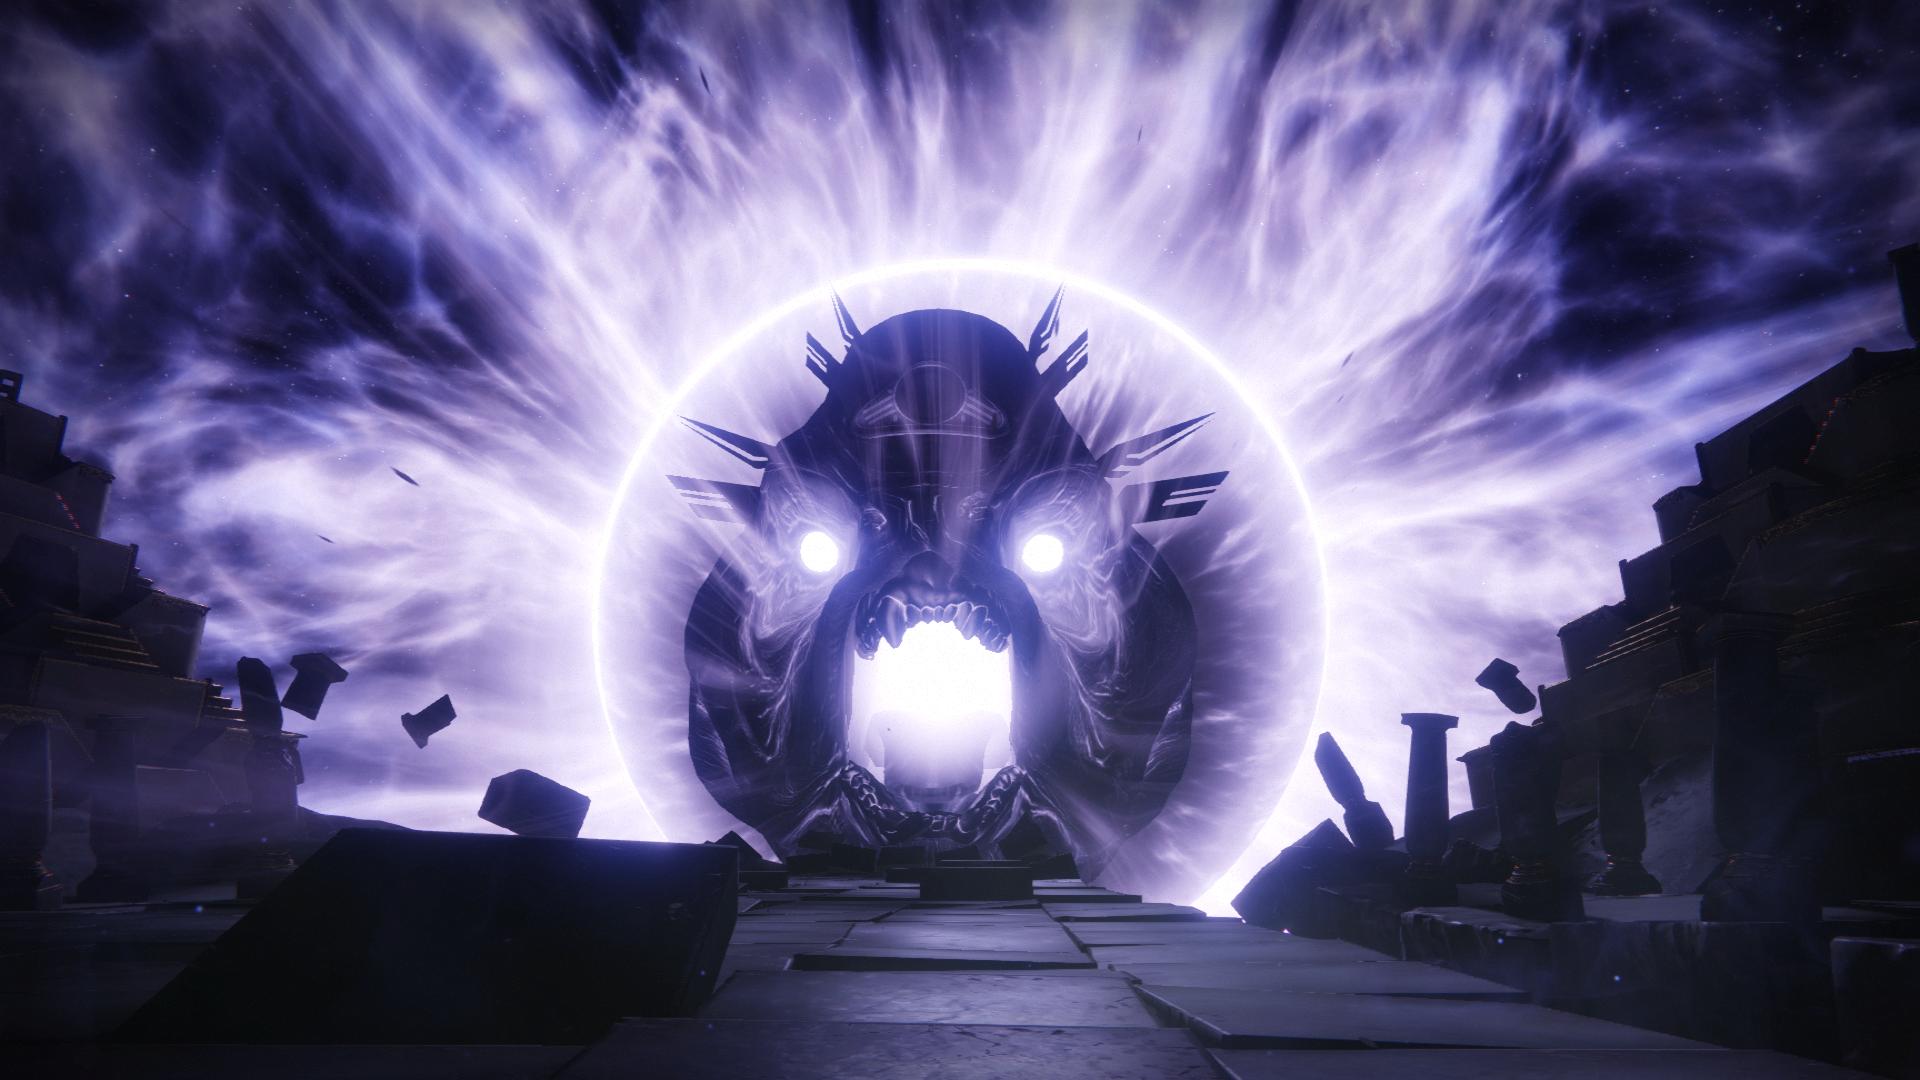 Destiny 2 Leviathan Backgrounds